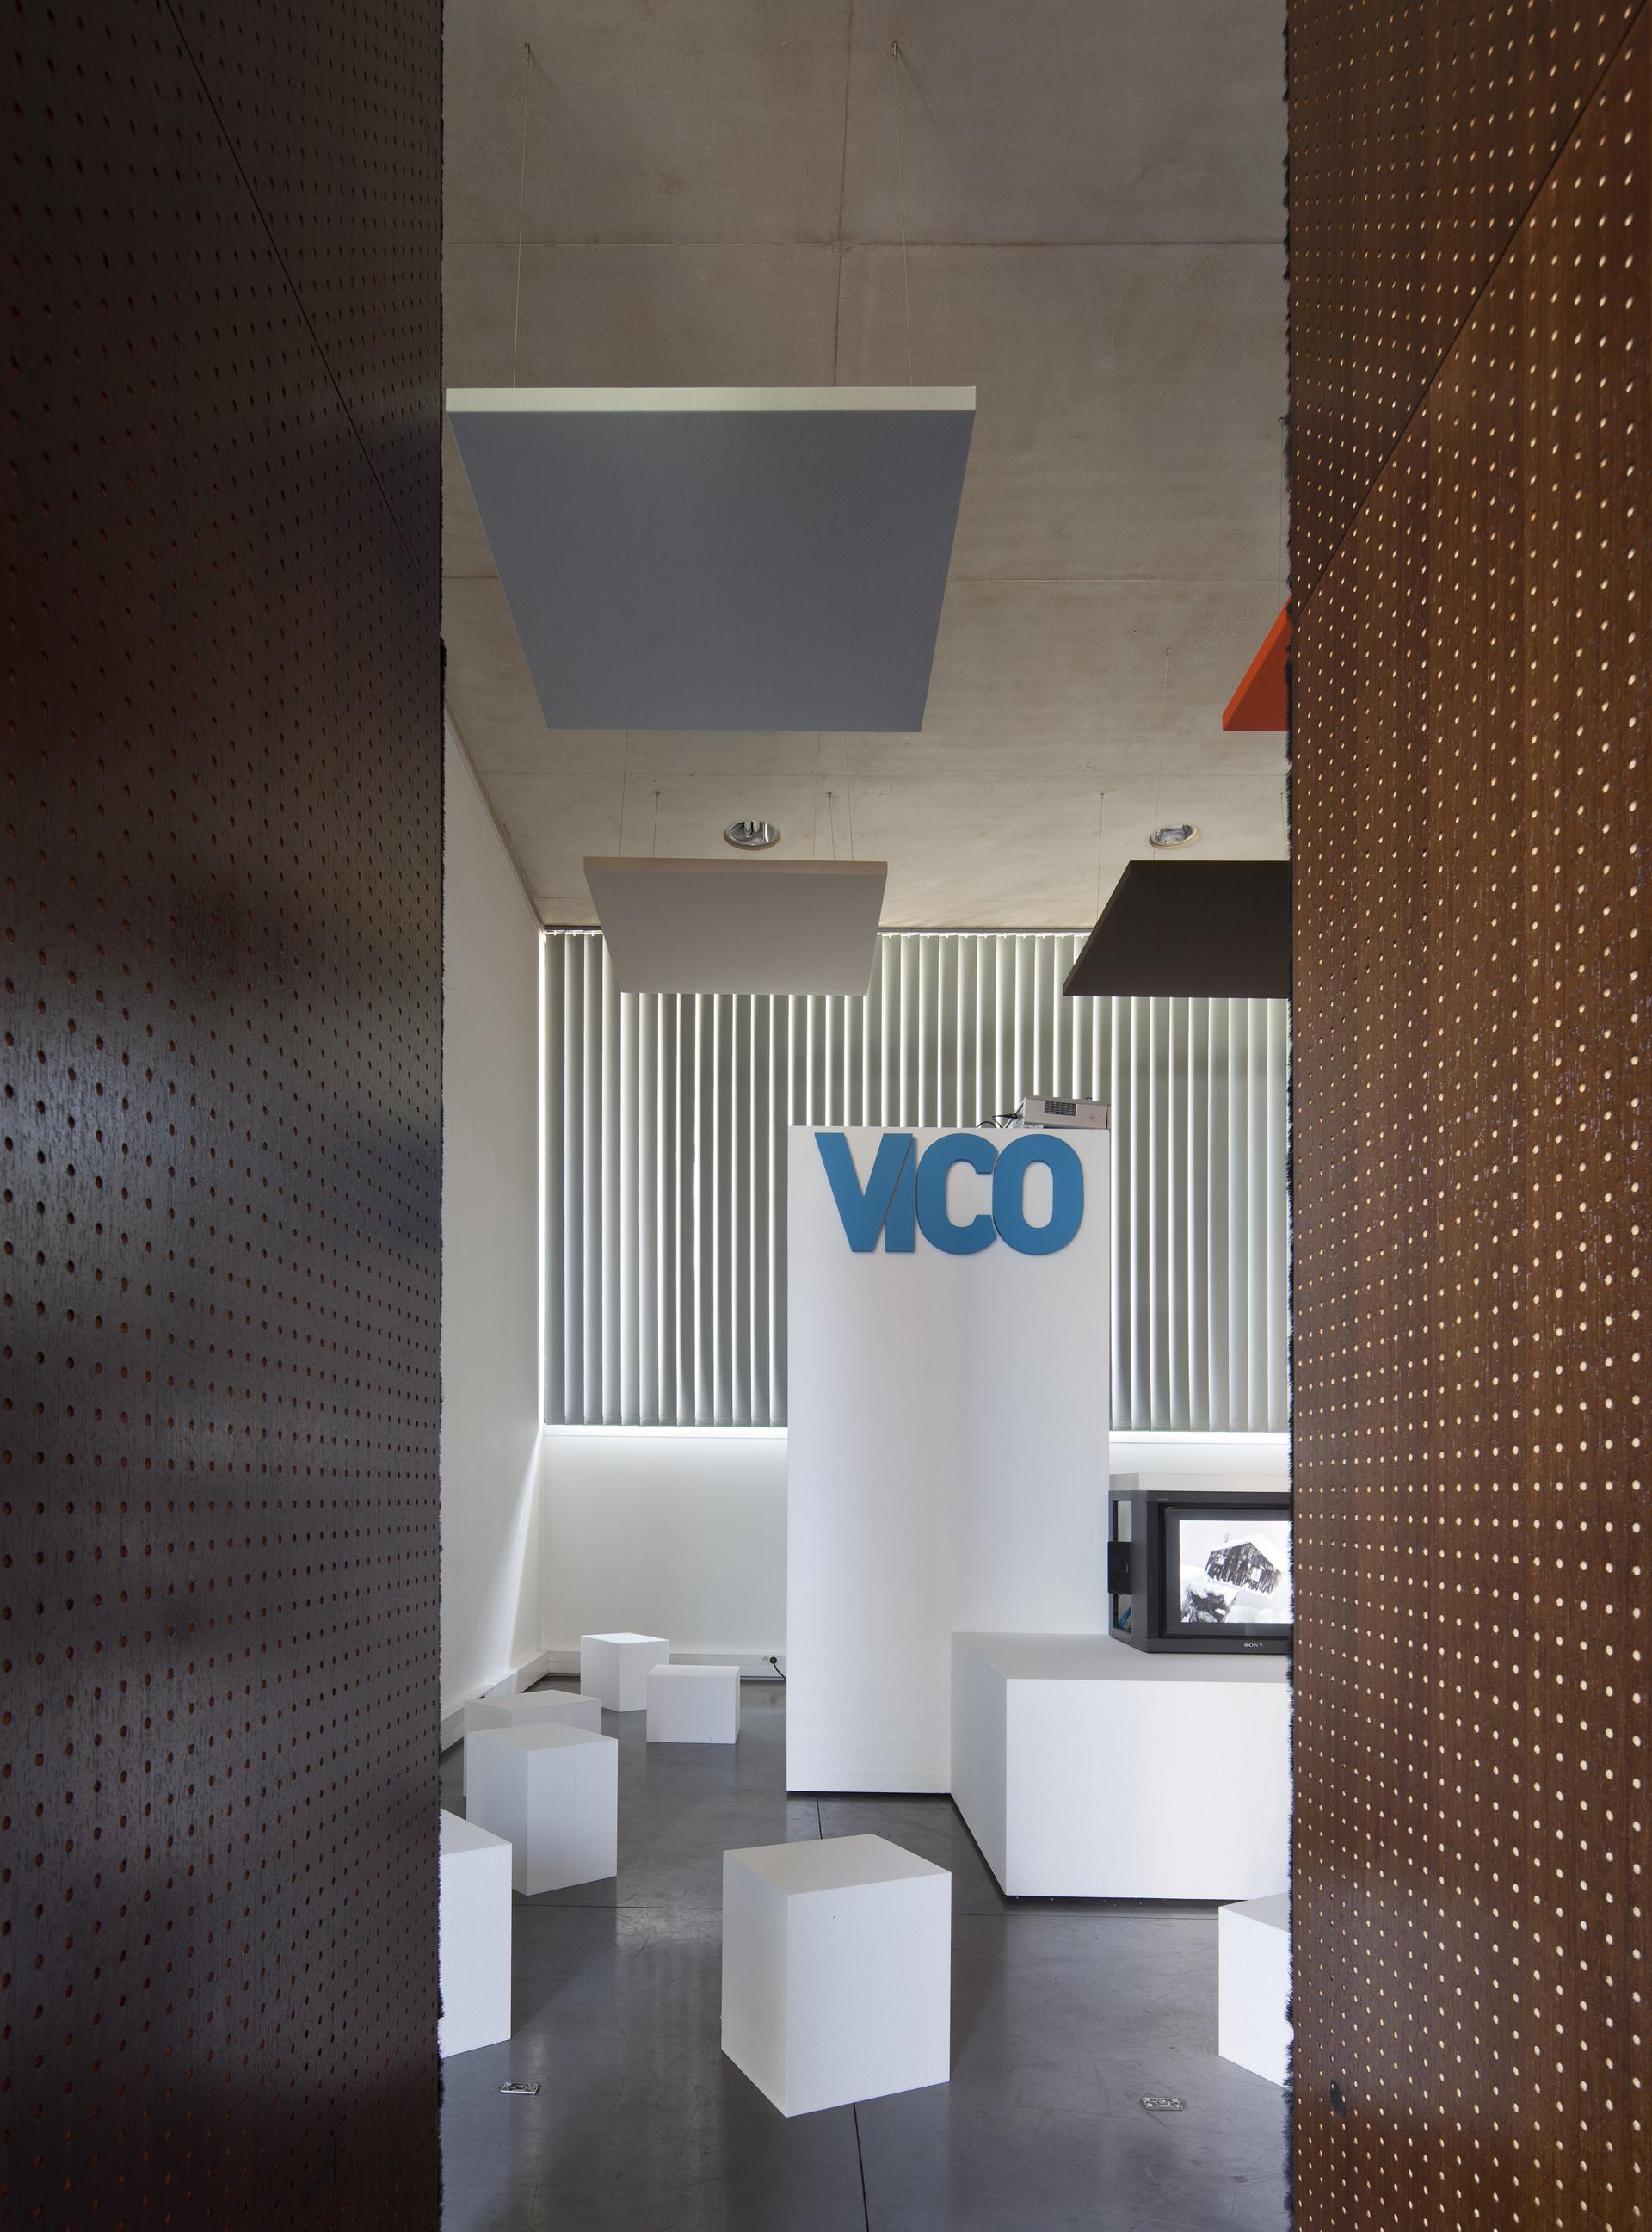 VICO_008.jpg